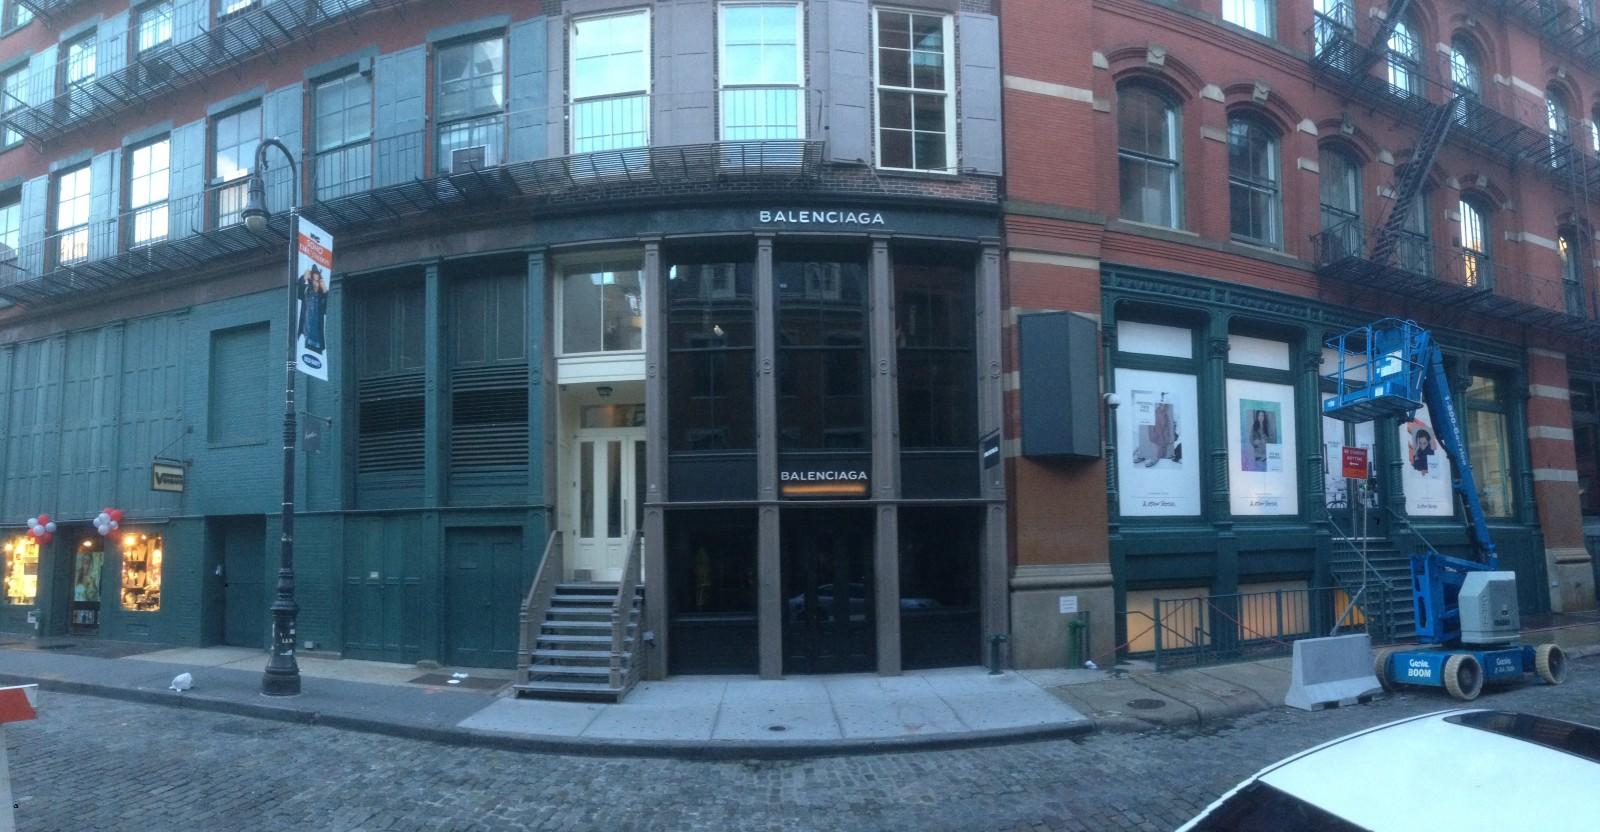 248406c96d839 Balenciaga 148 Mercer St New York